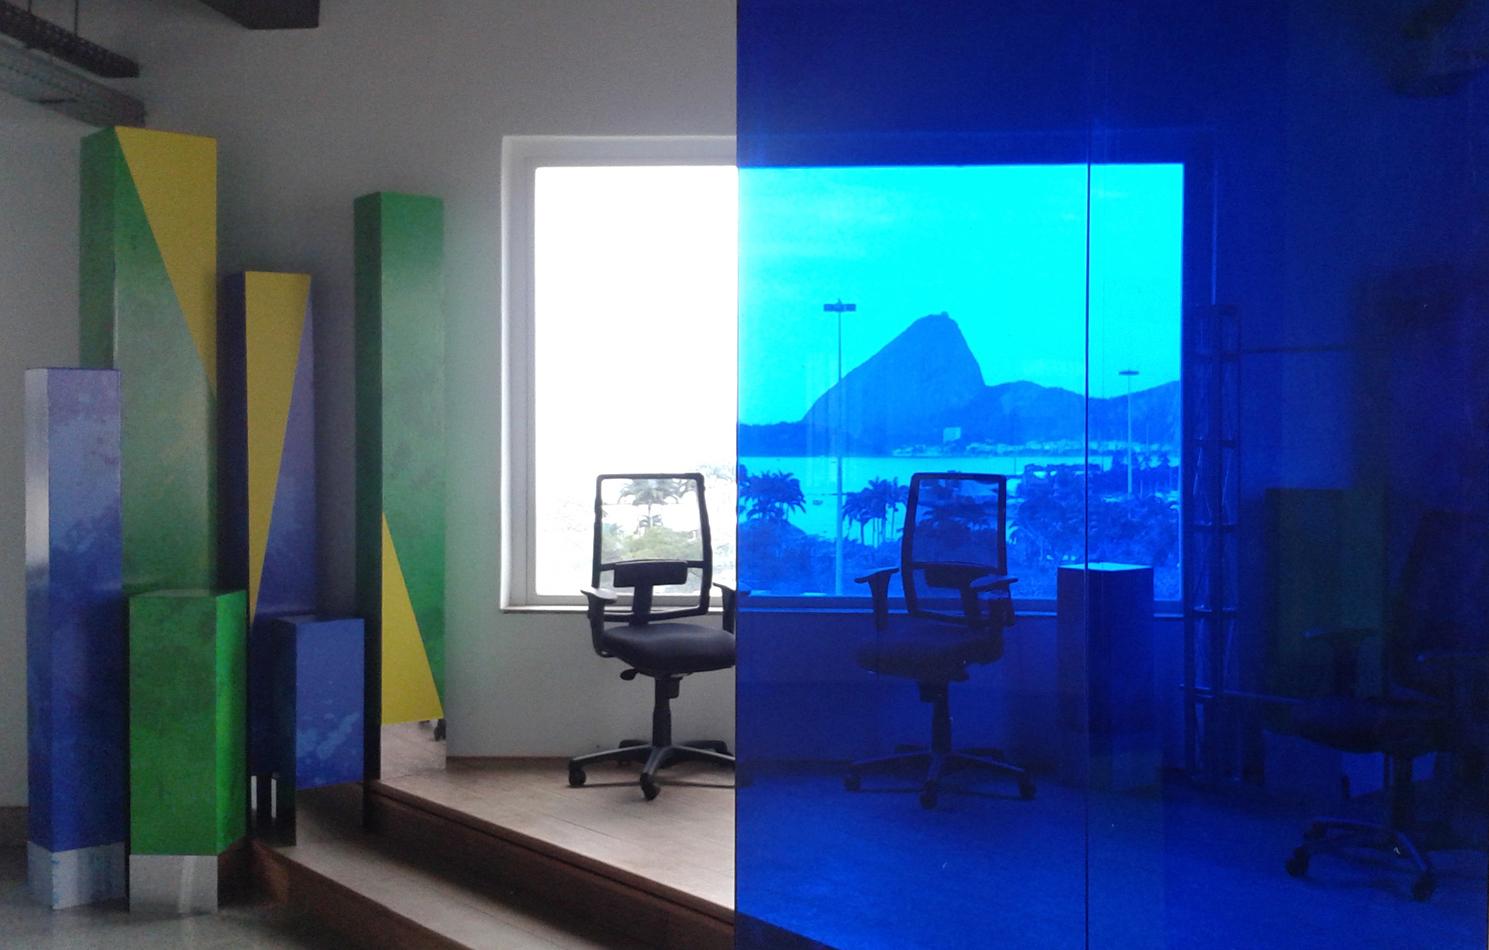 RAI television broadcasting studio